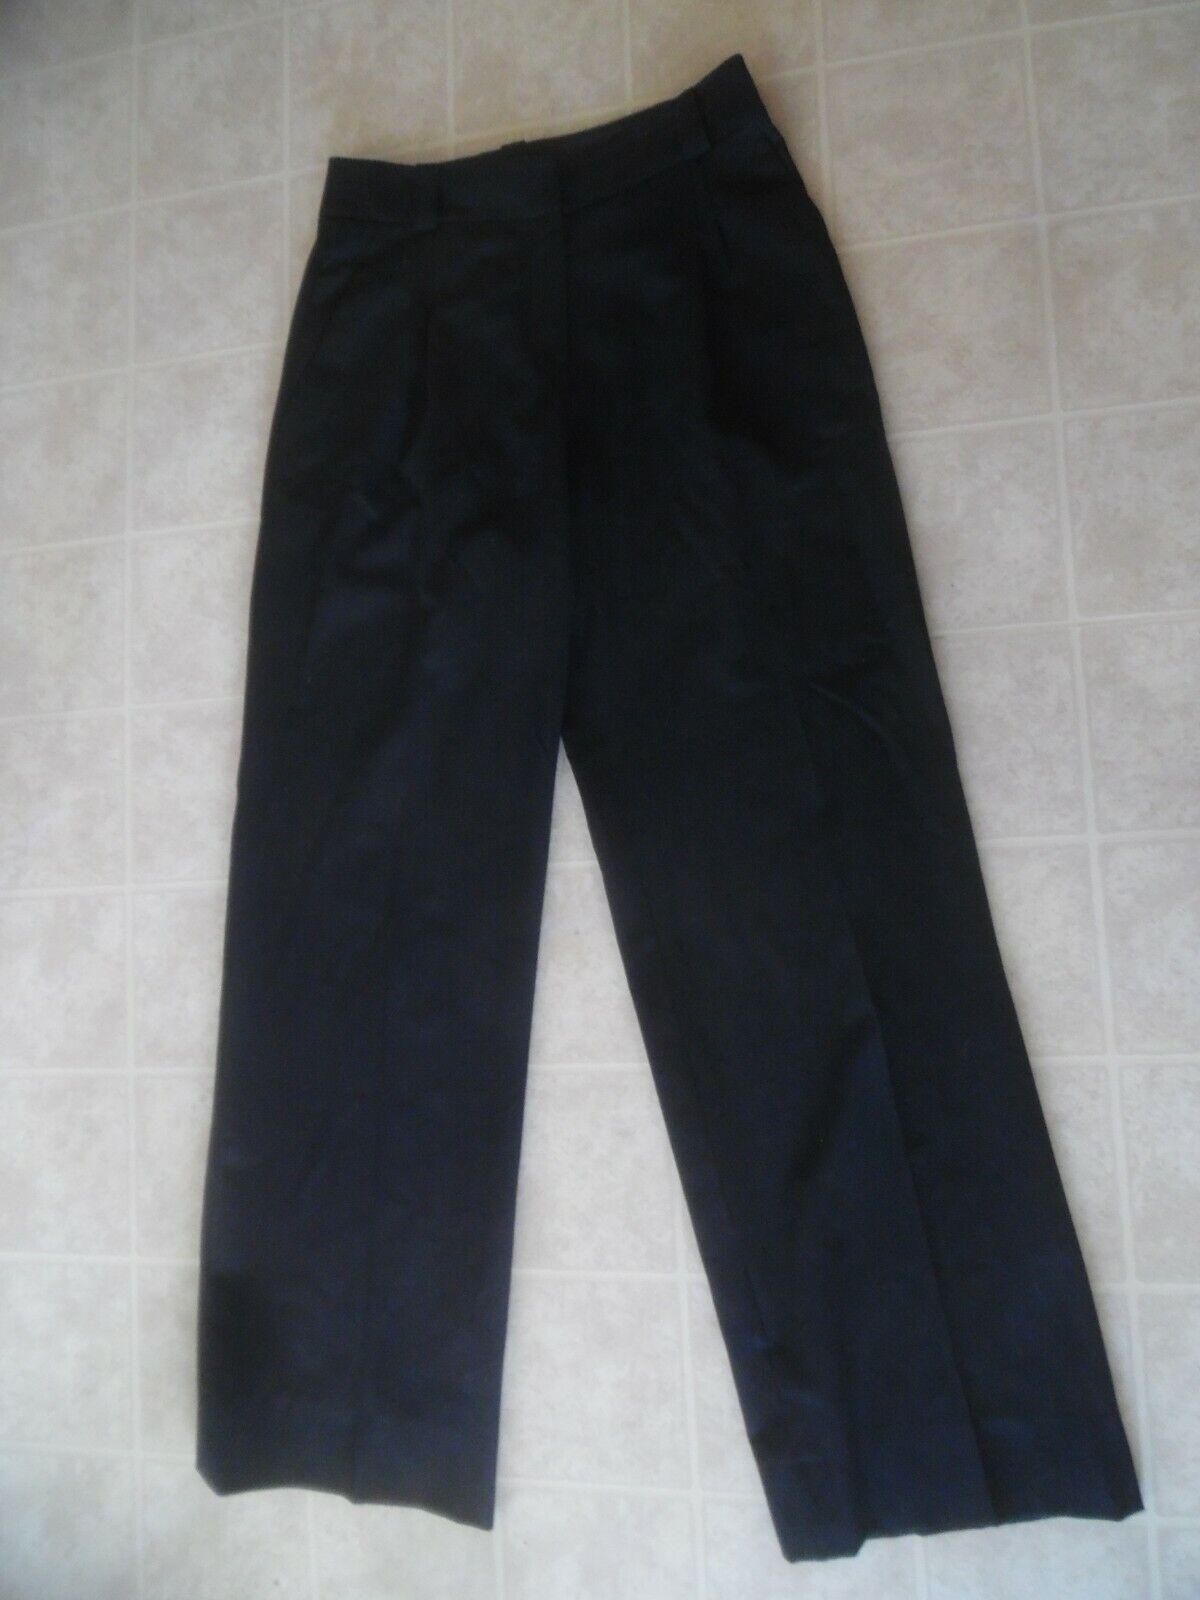 Giorgio Armani Dress Pants Wool Women Sz 40 Charcoal Straight Leg